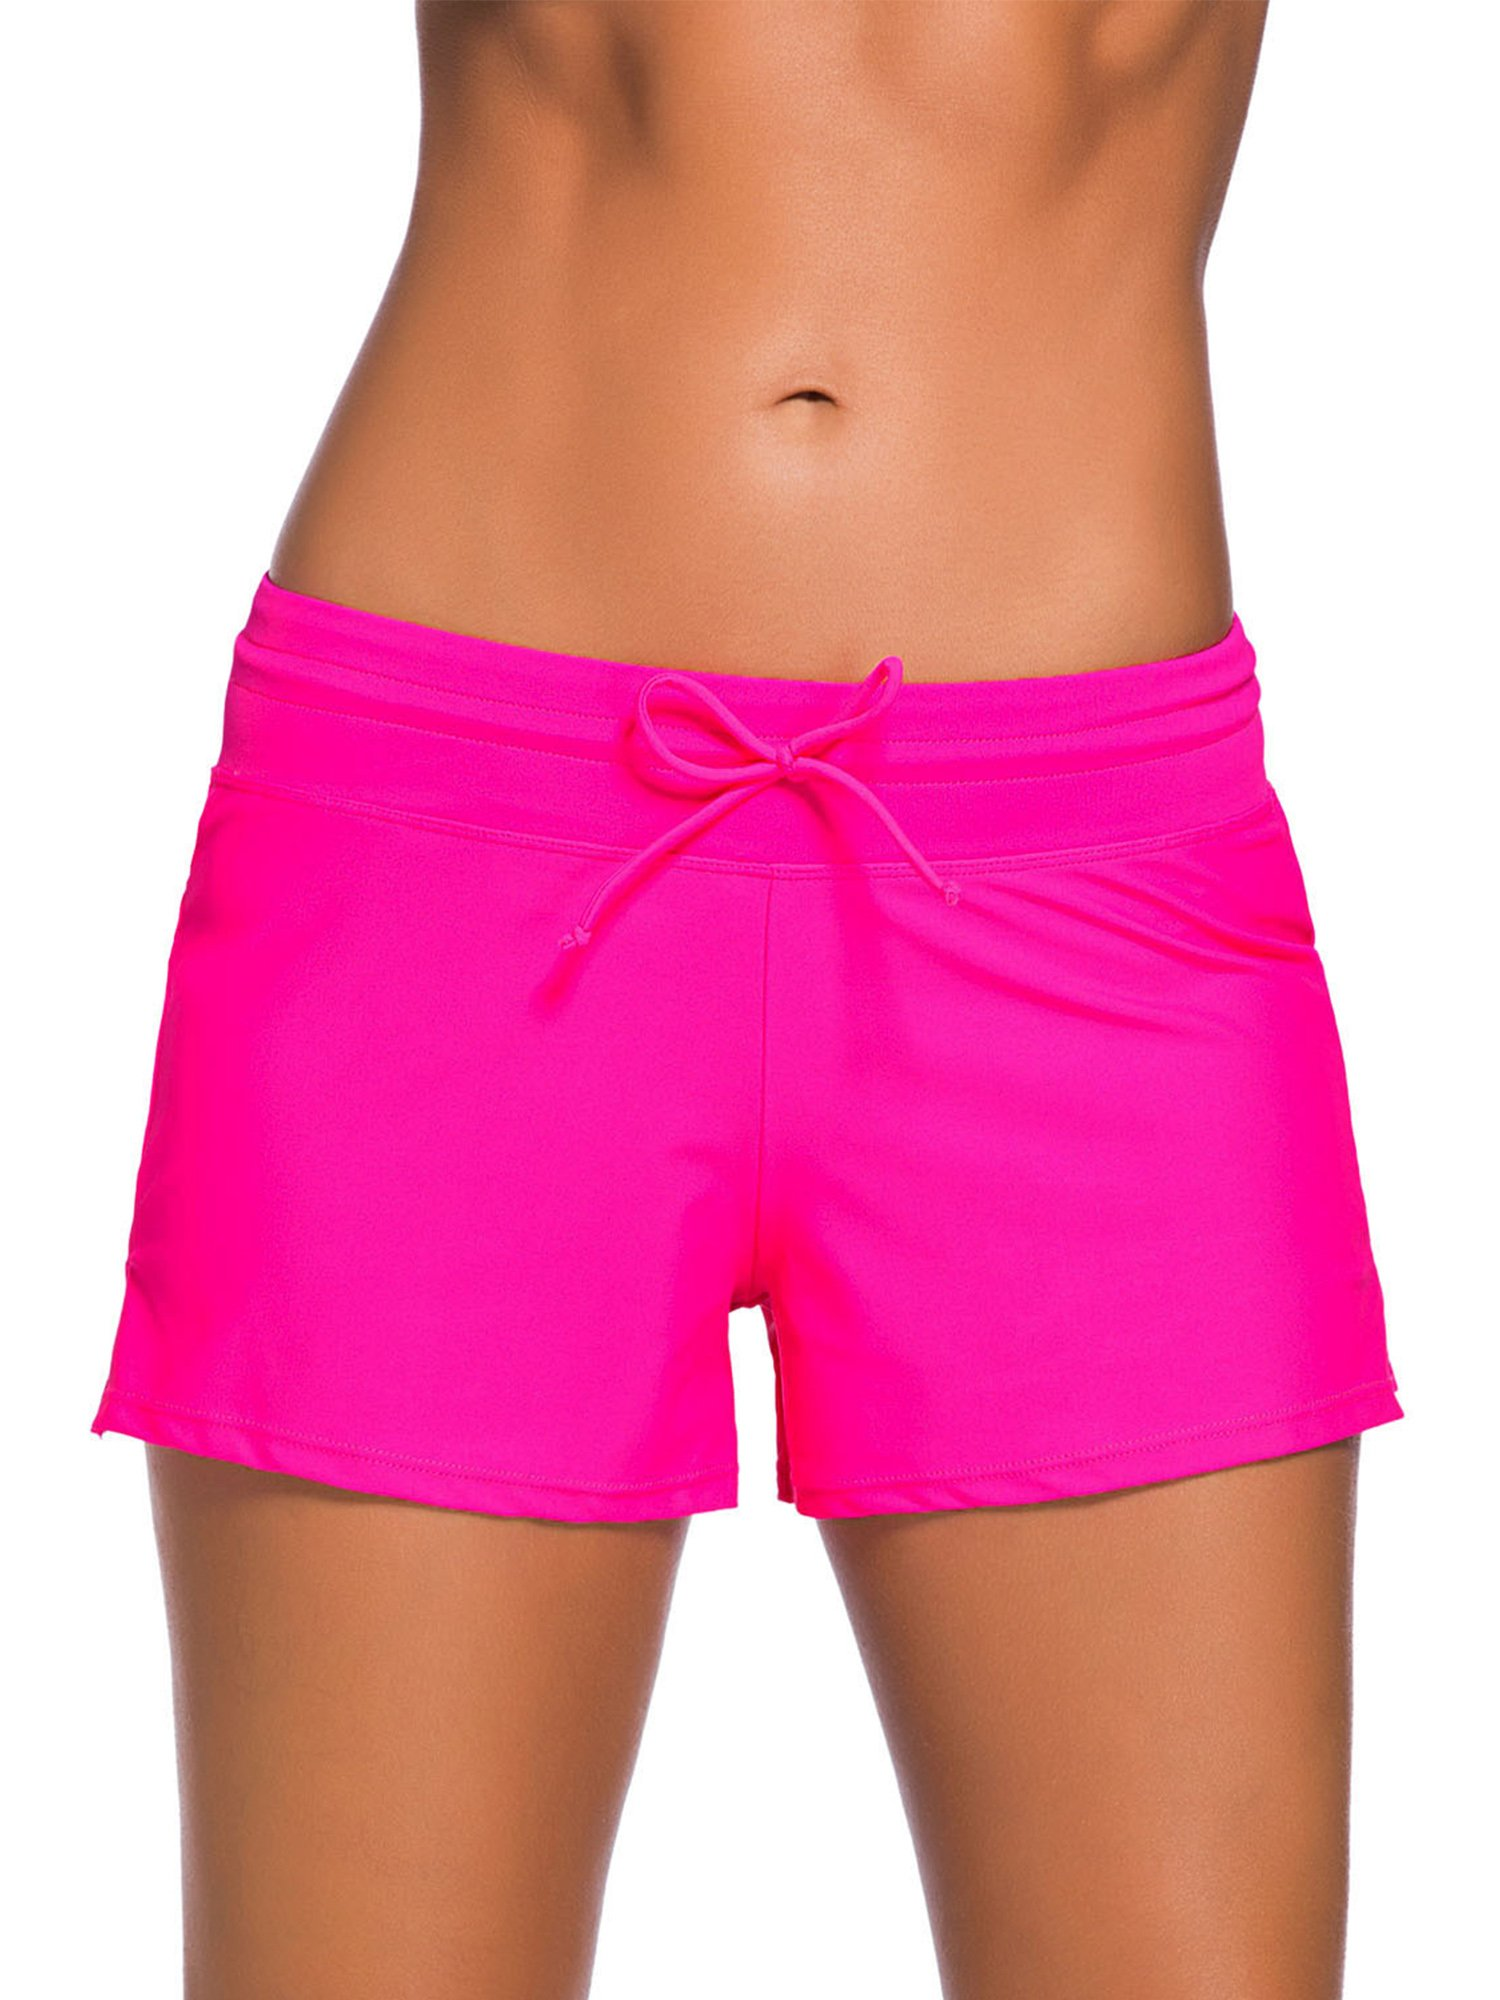 Satinior Women Swimsuit Shorts Tankini Swim Briefs Side Split Plus Size Bottom Boardshort Summer Beach Swimwear Trunks (L Size, Rose Red)